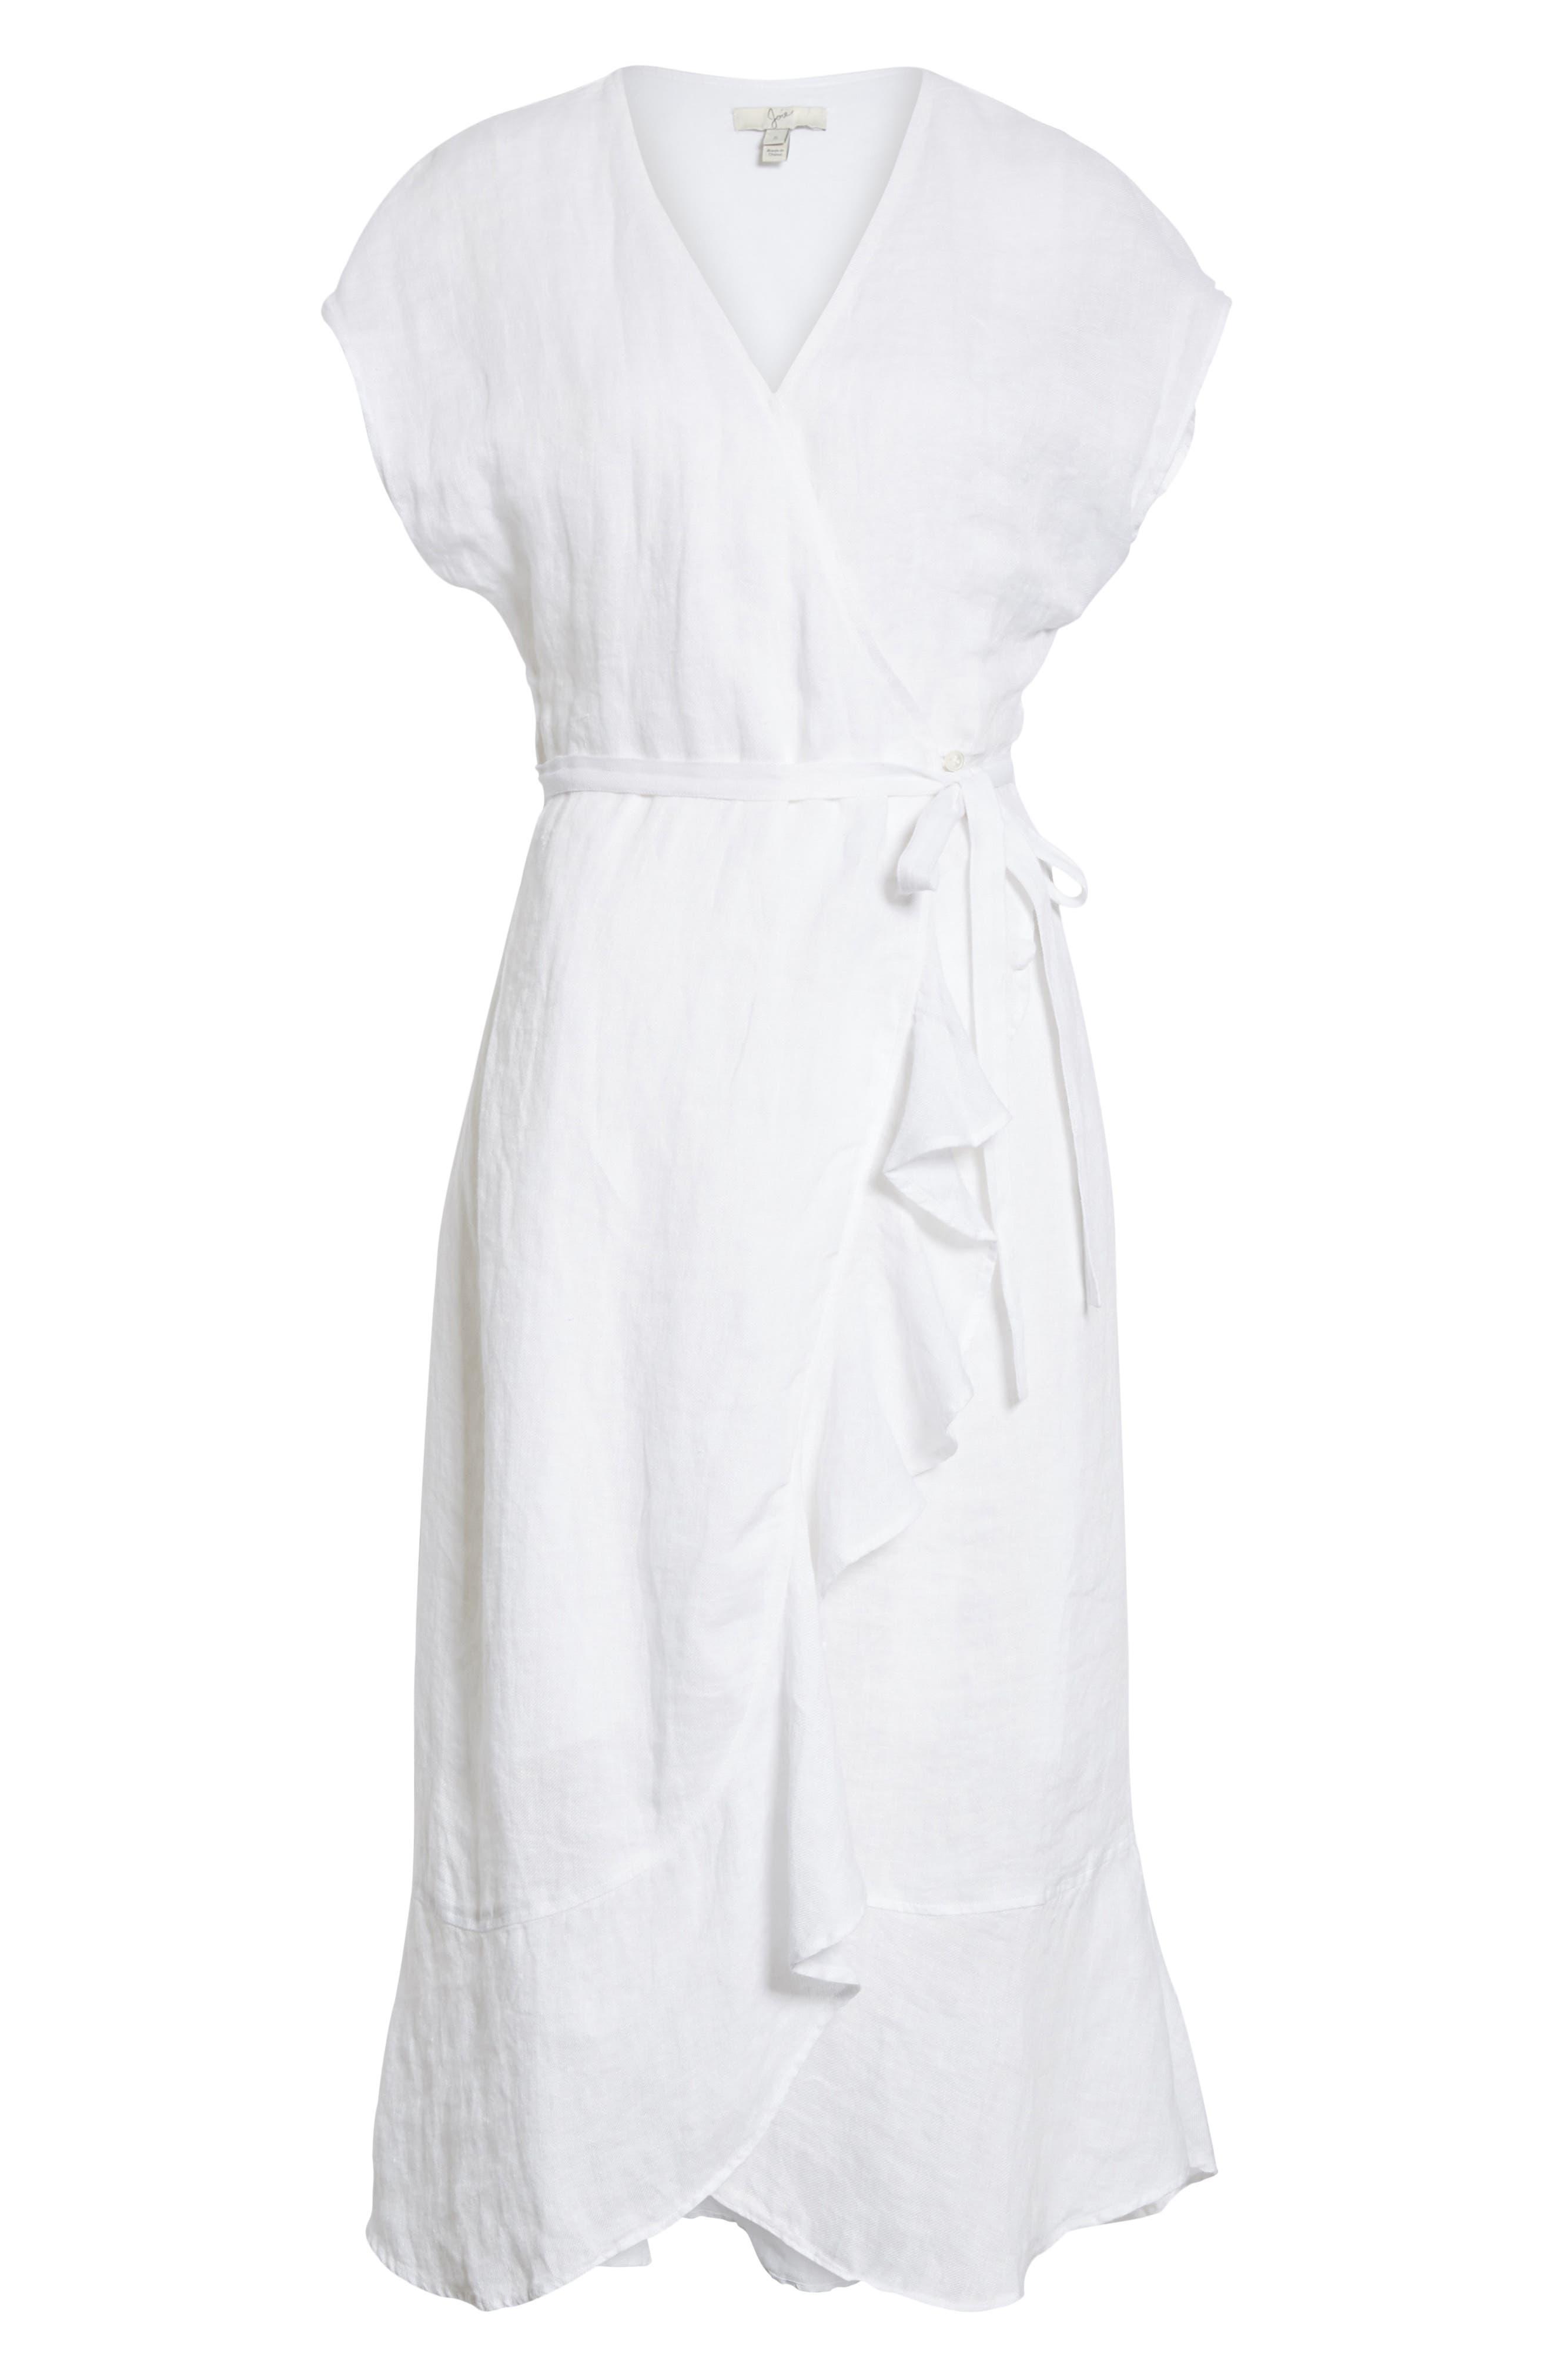 Filma Back Cutout Linen Wrap Dress,                             Alternate thumbnail 6, color,                             PORCELAIN